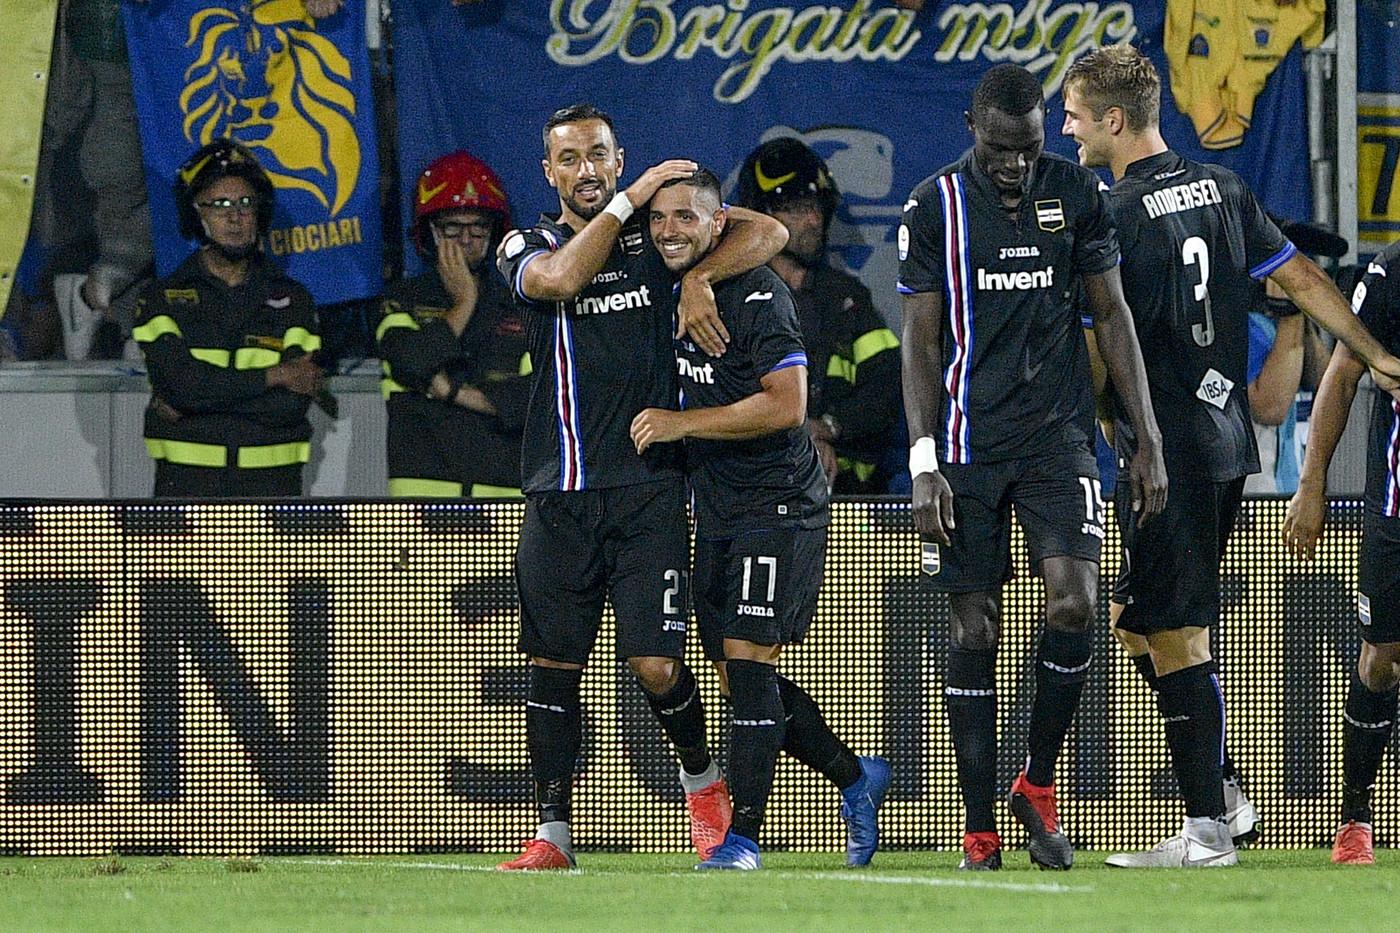 Serie A, Frosinone-Sampdoria: 0-5 | Fotoracconto